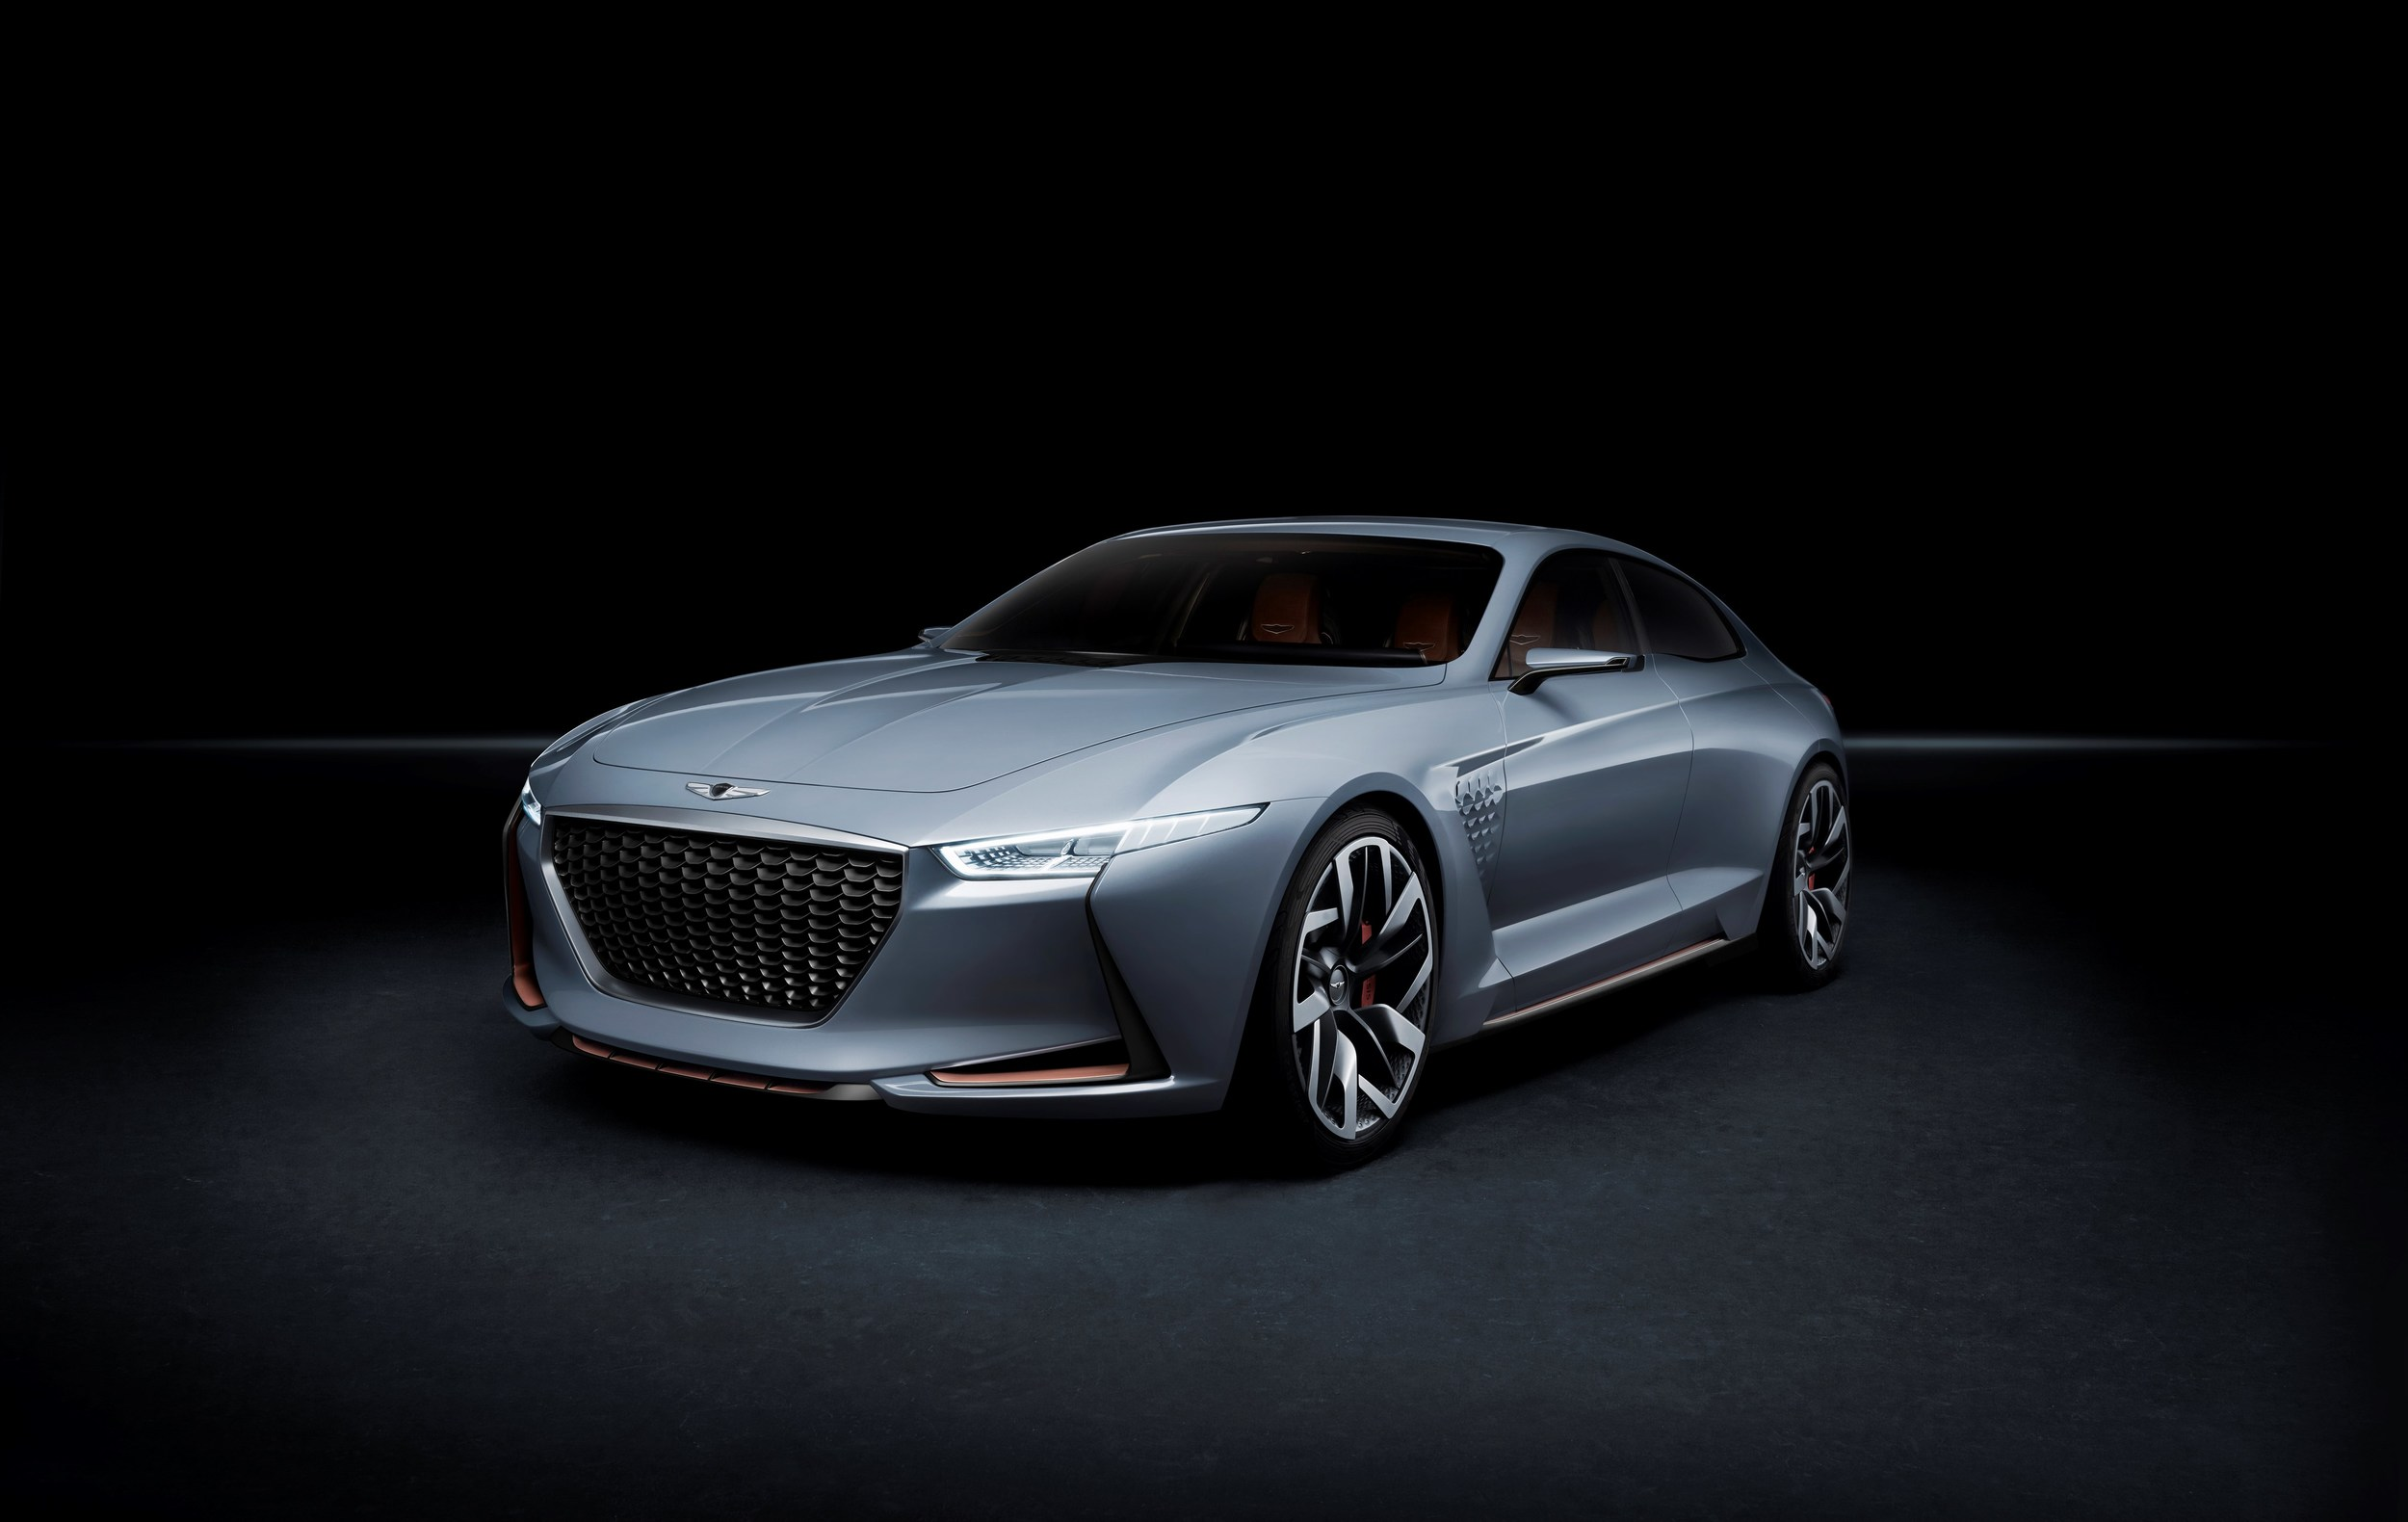 Hyundai Elantra Coupe >> 2018 Genesis G70 Imagined by Brenthon Design - autoevolution